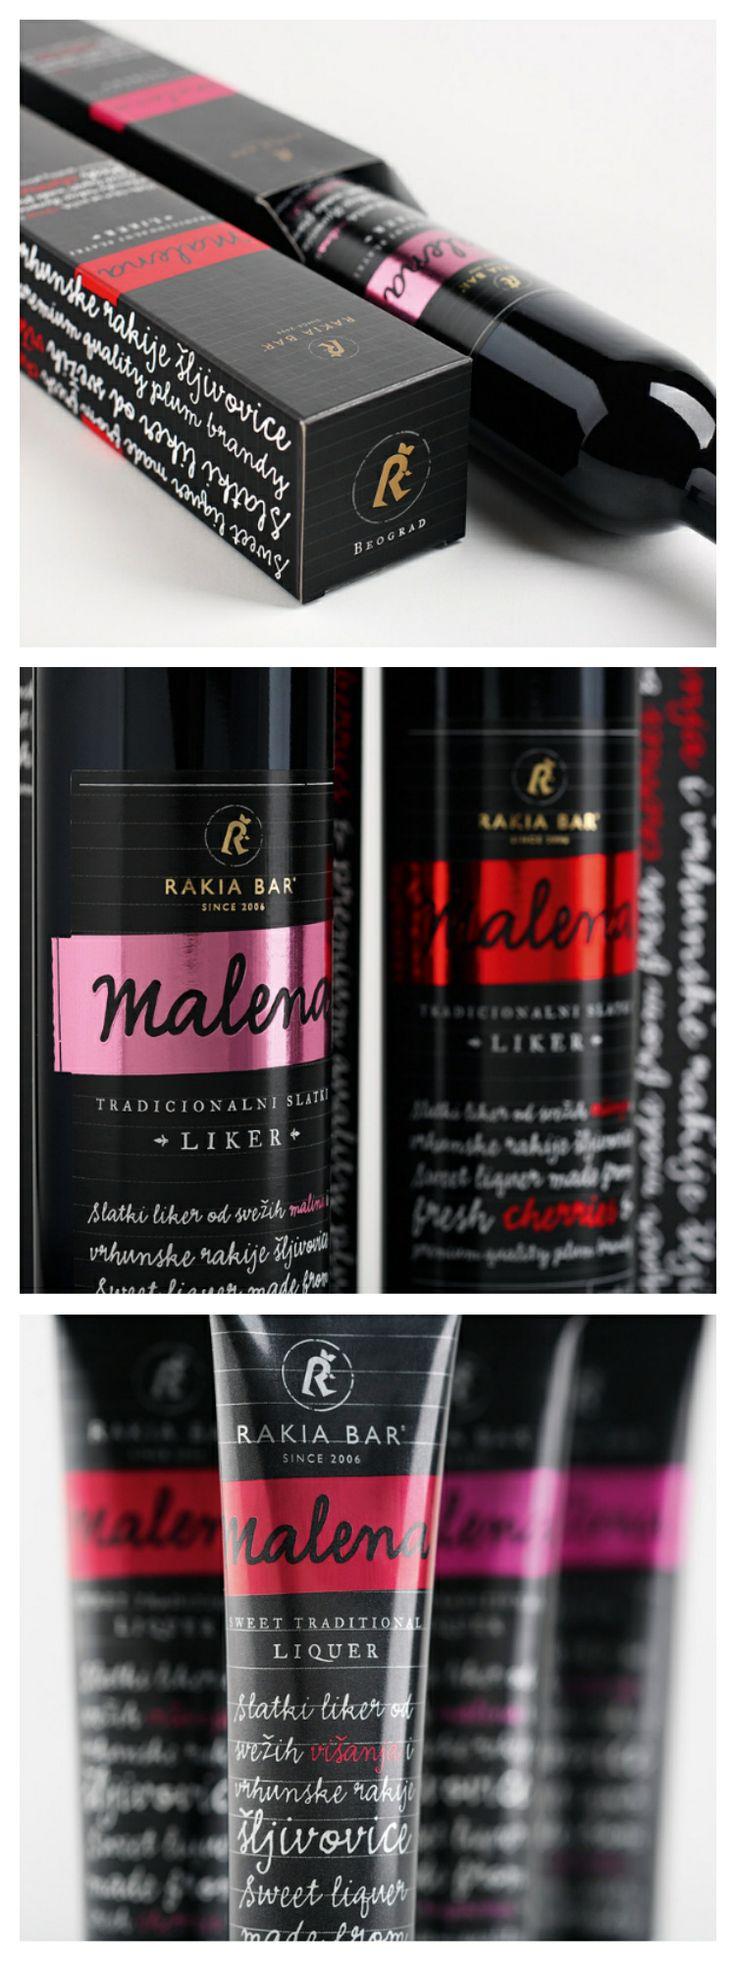 Malena Liquer, Rakija Bar... Sweet packaging.. http://www.cobaassociates.com/portfolio/malena-liquer.htm